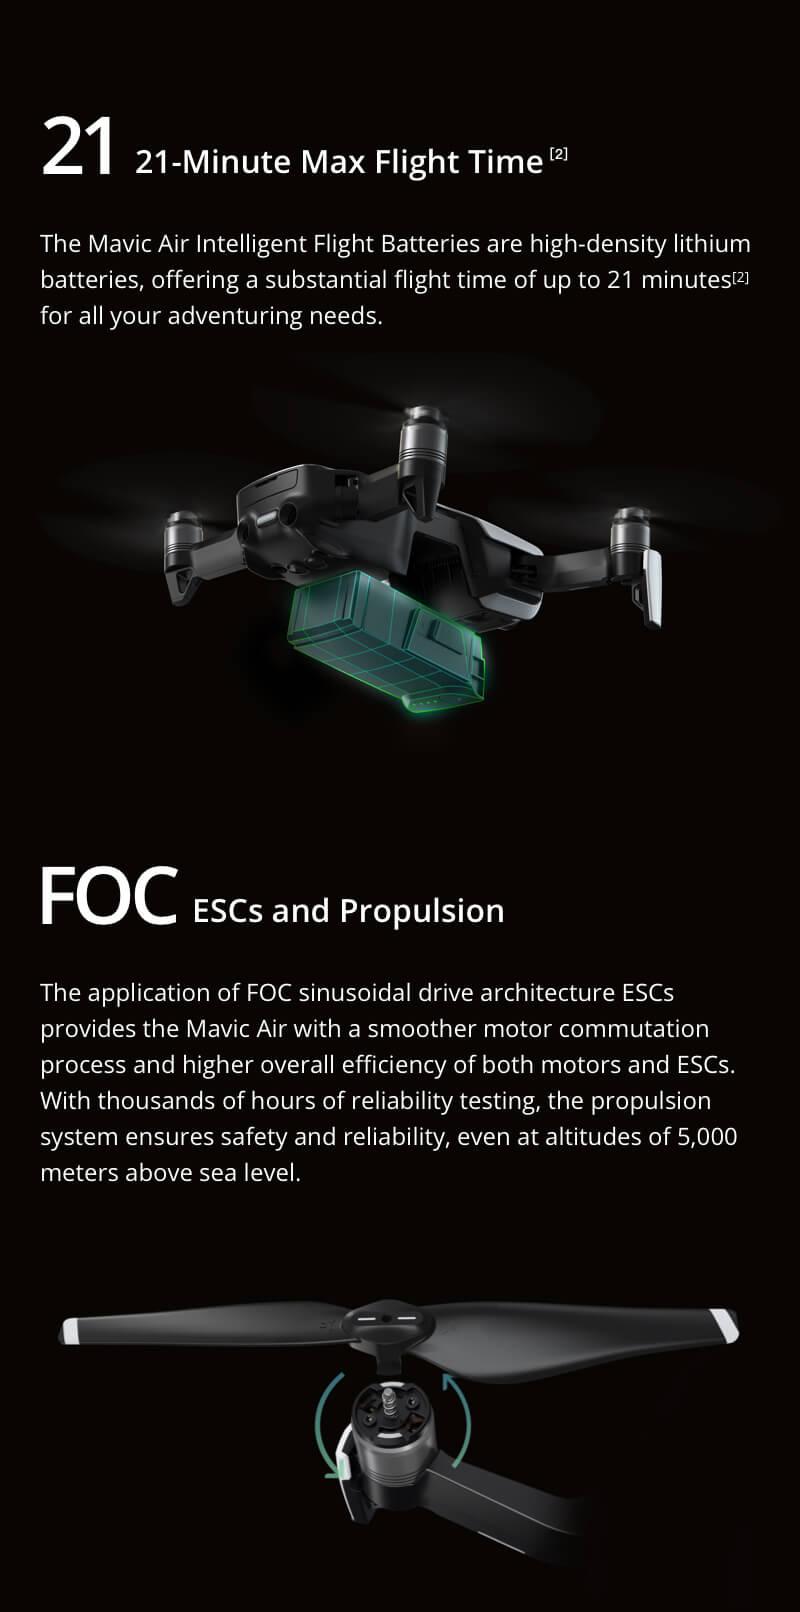 Mavic Air - Ultraportable 4K Quadcopter - Arctic White 25